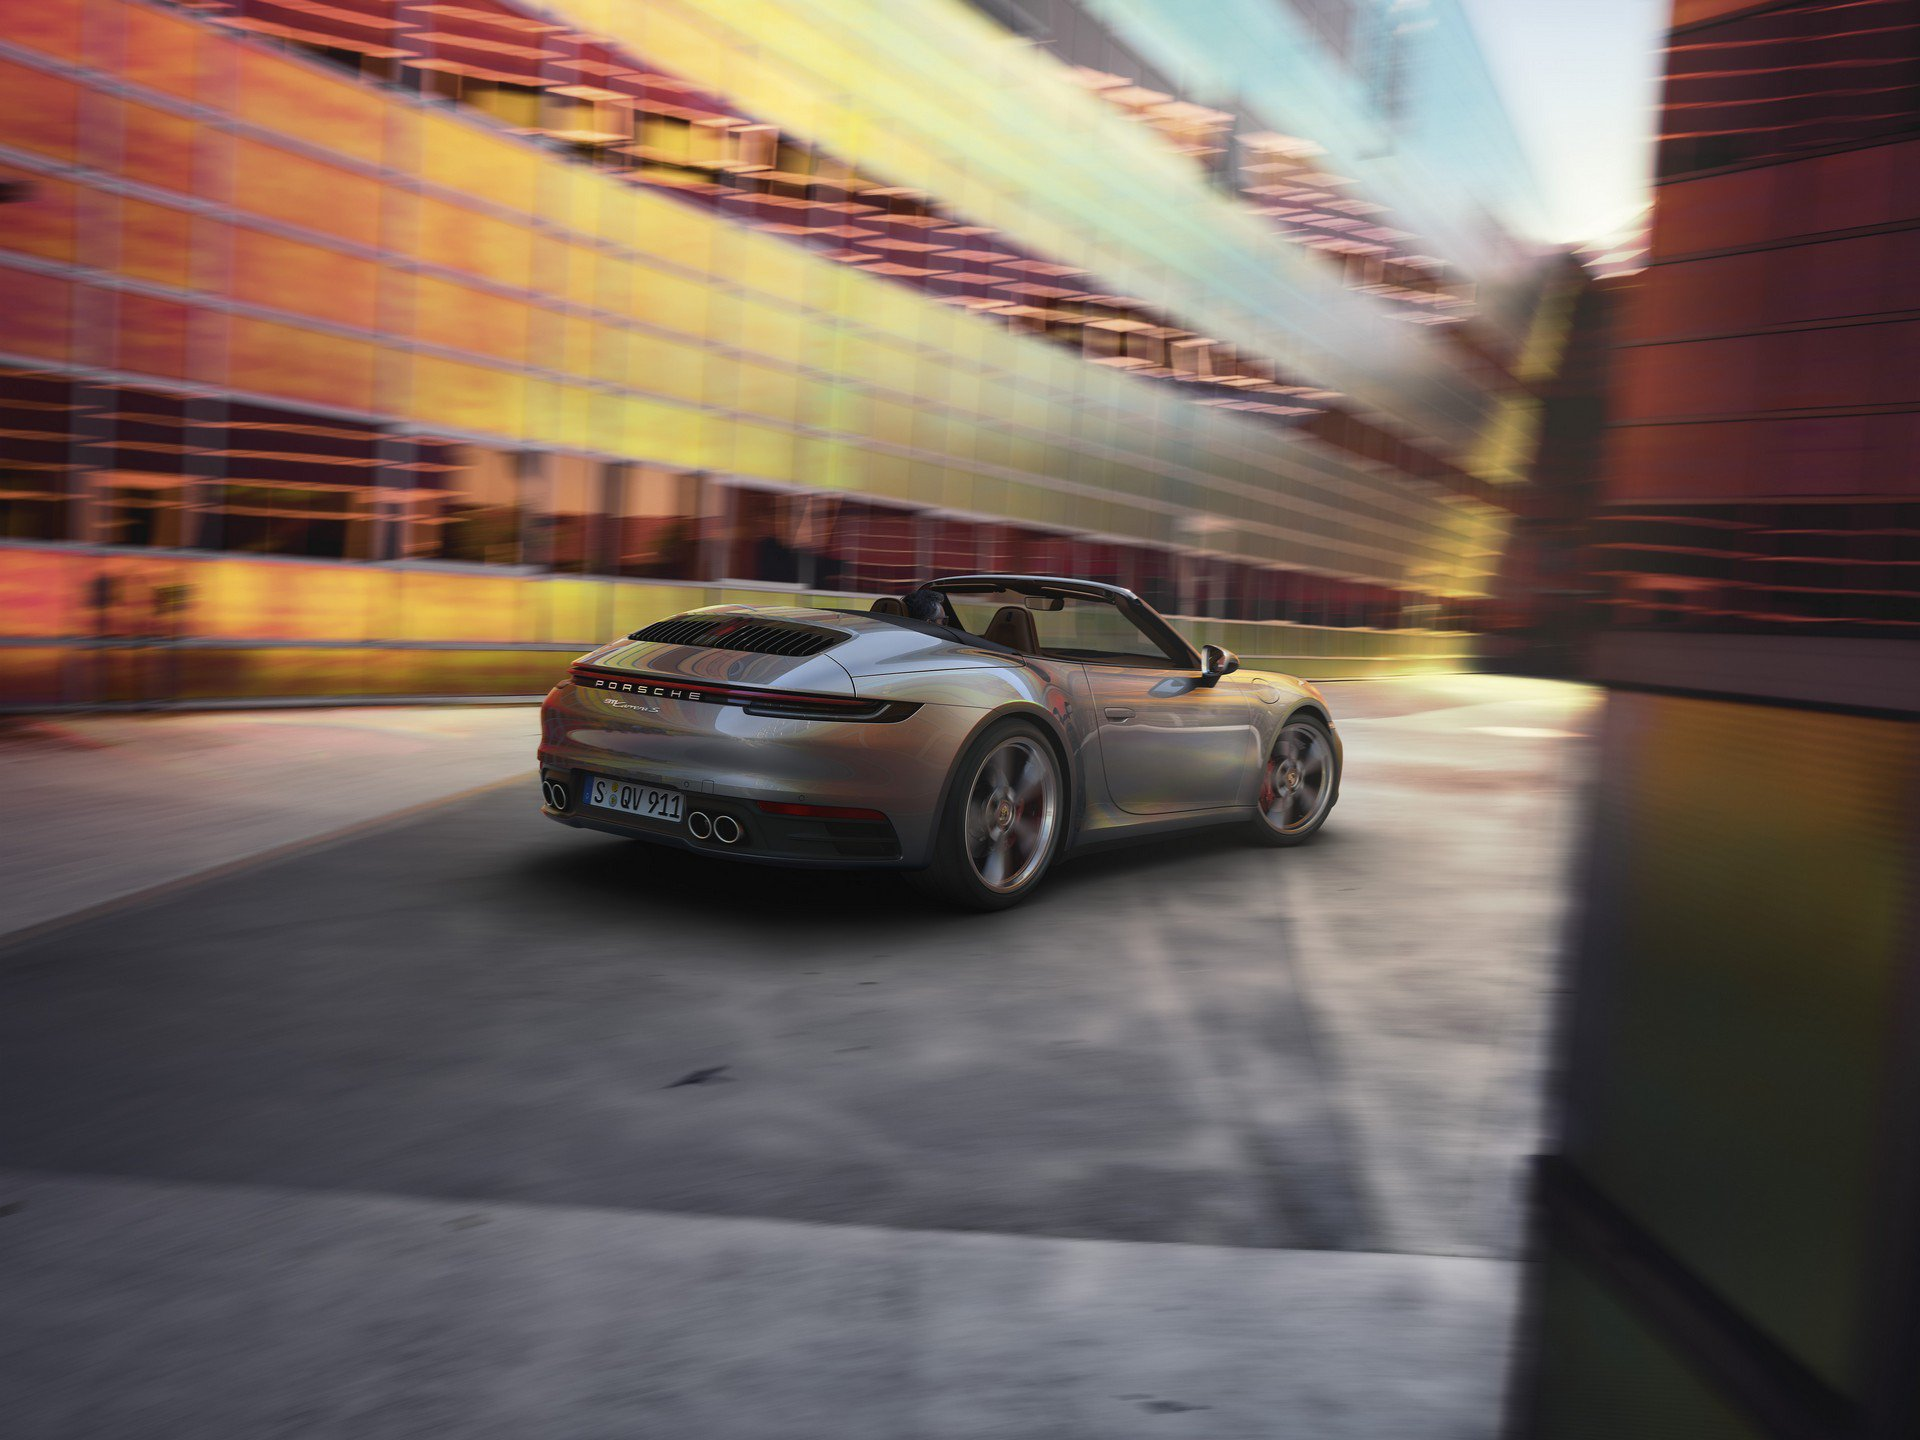 8a25b917-2020-porsche-911-convertible-1